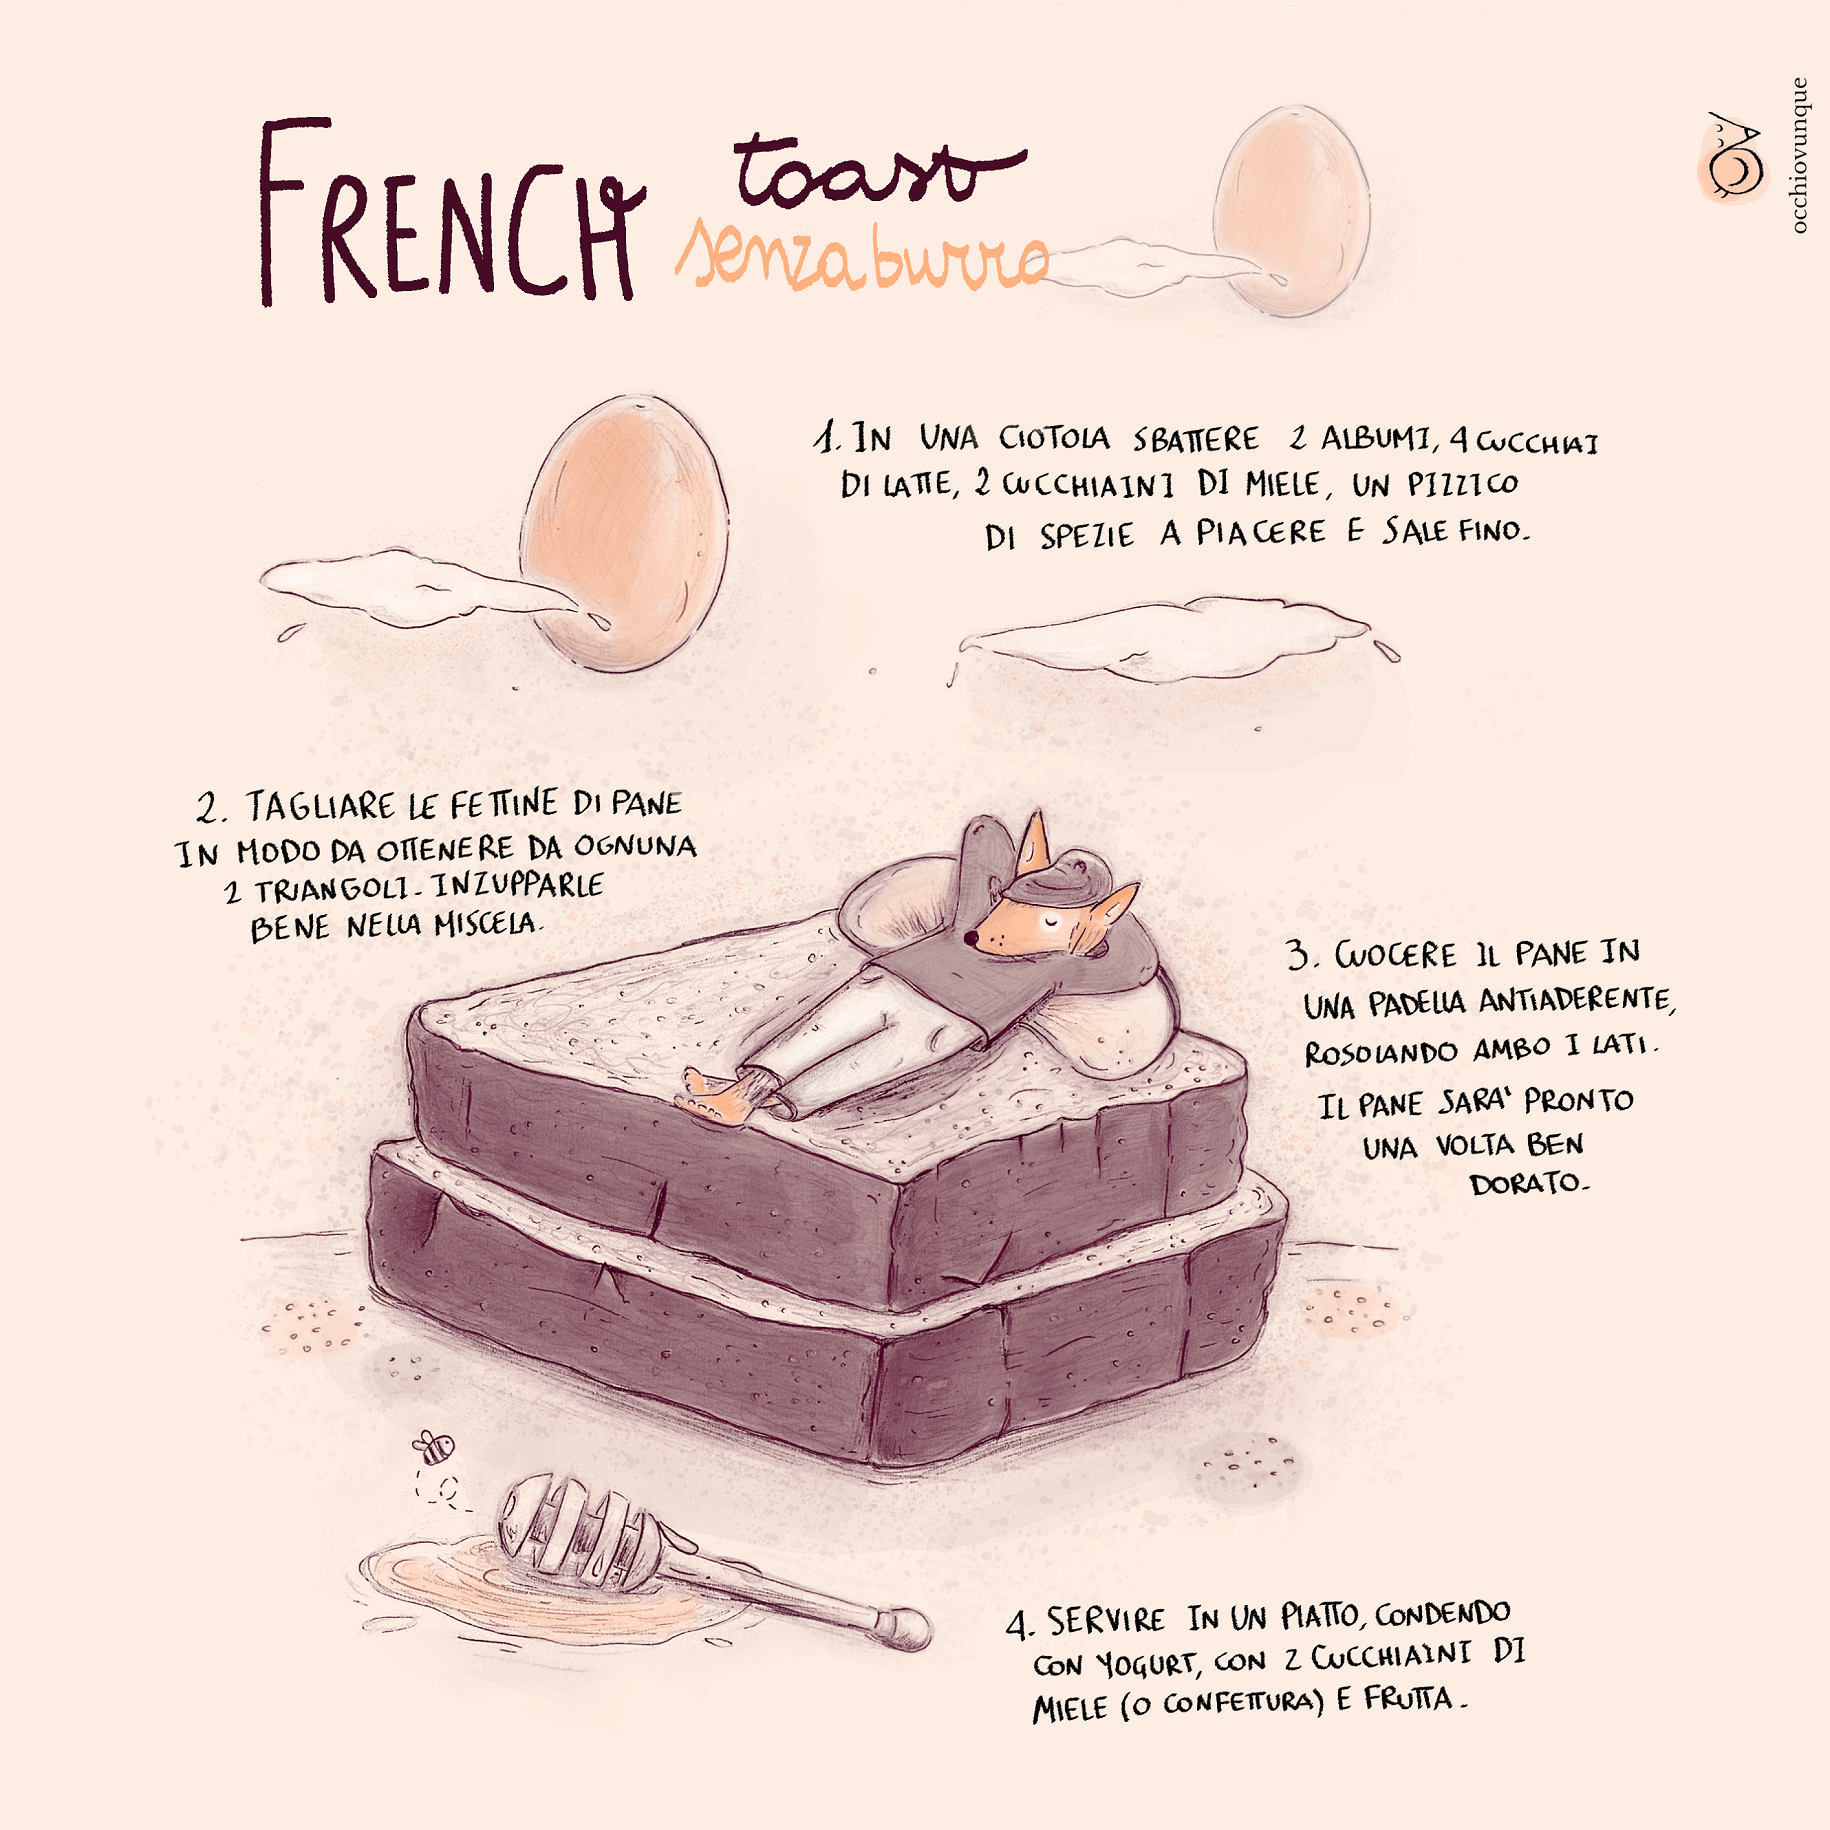 french toast senza burro ricetta disegnata Valentina Scannapieco